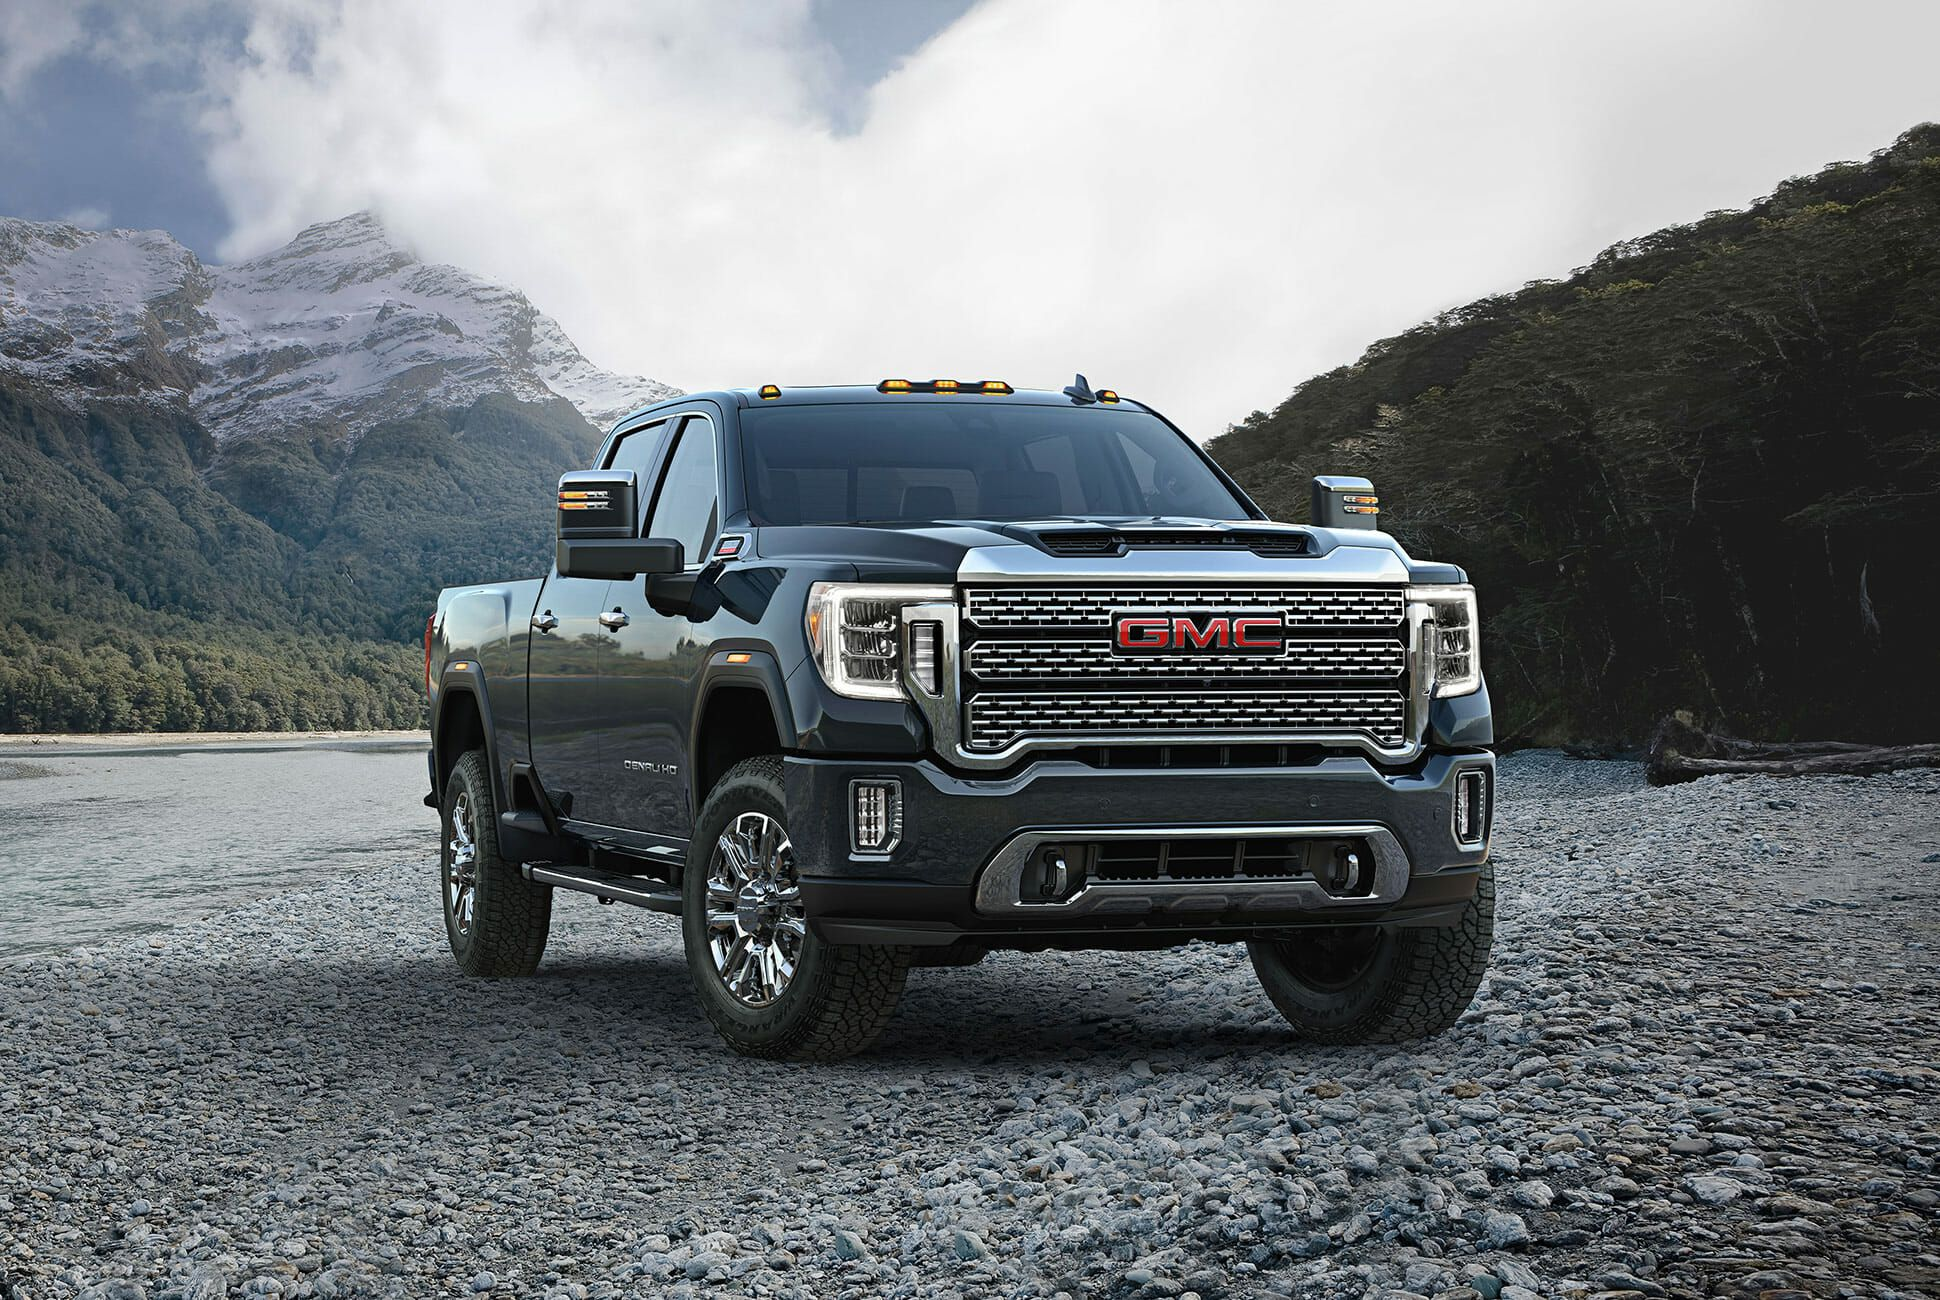 Gmc Terrain 2020 Review.2020 Gmc Sierra Hd Review The Classy Tow Truck Gear Patrol